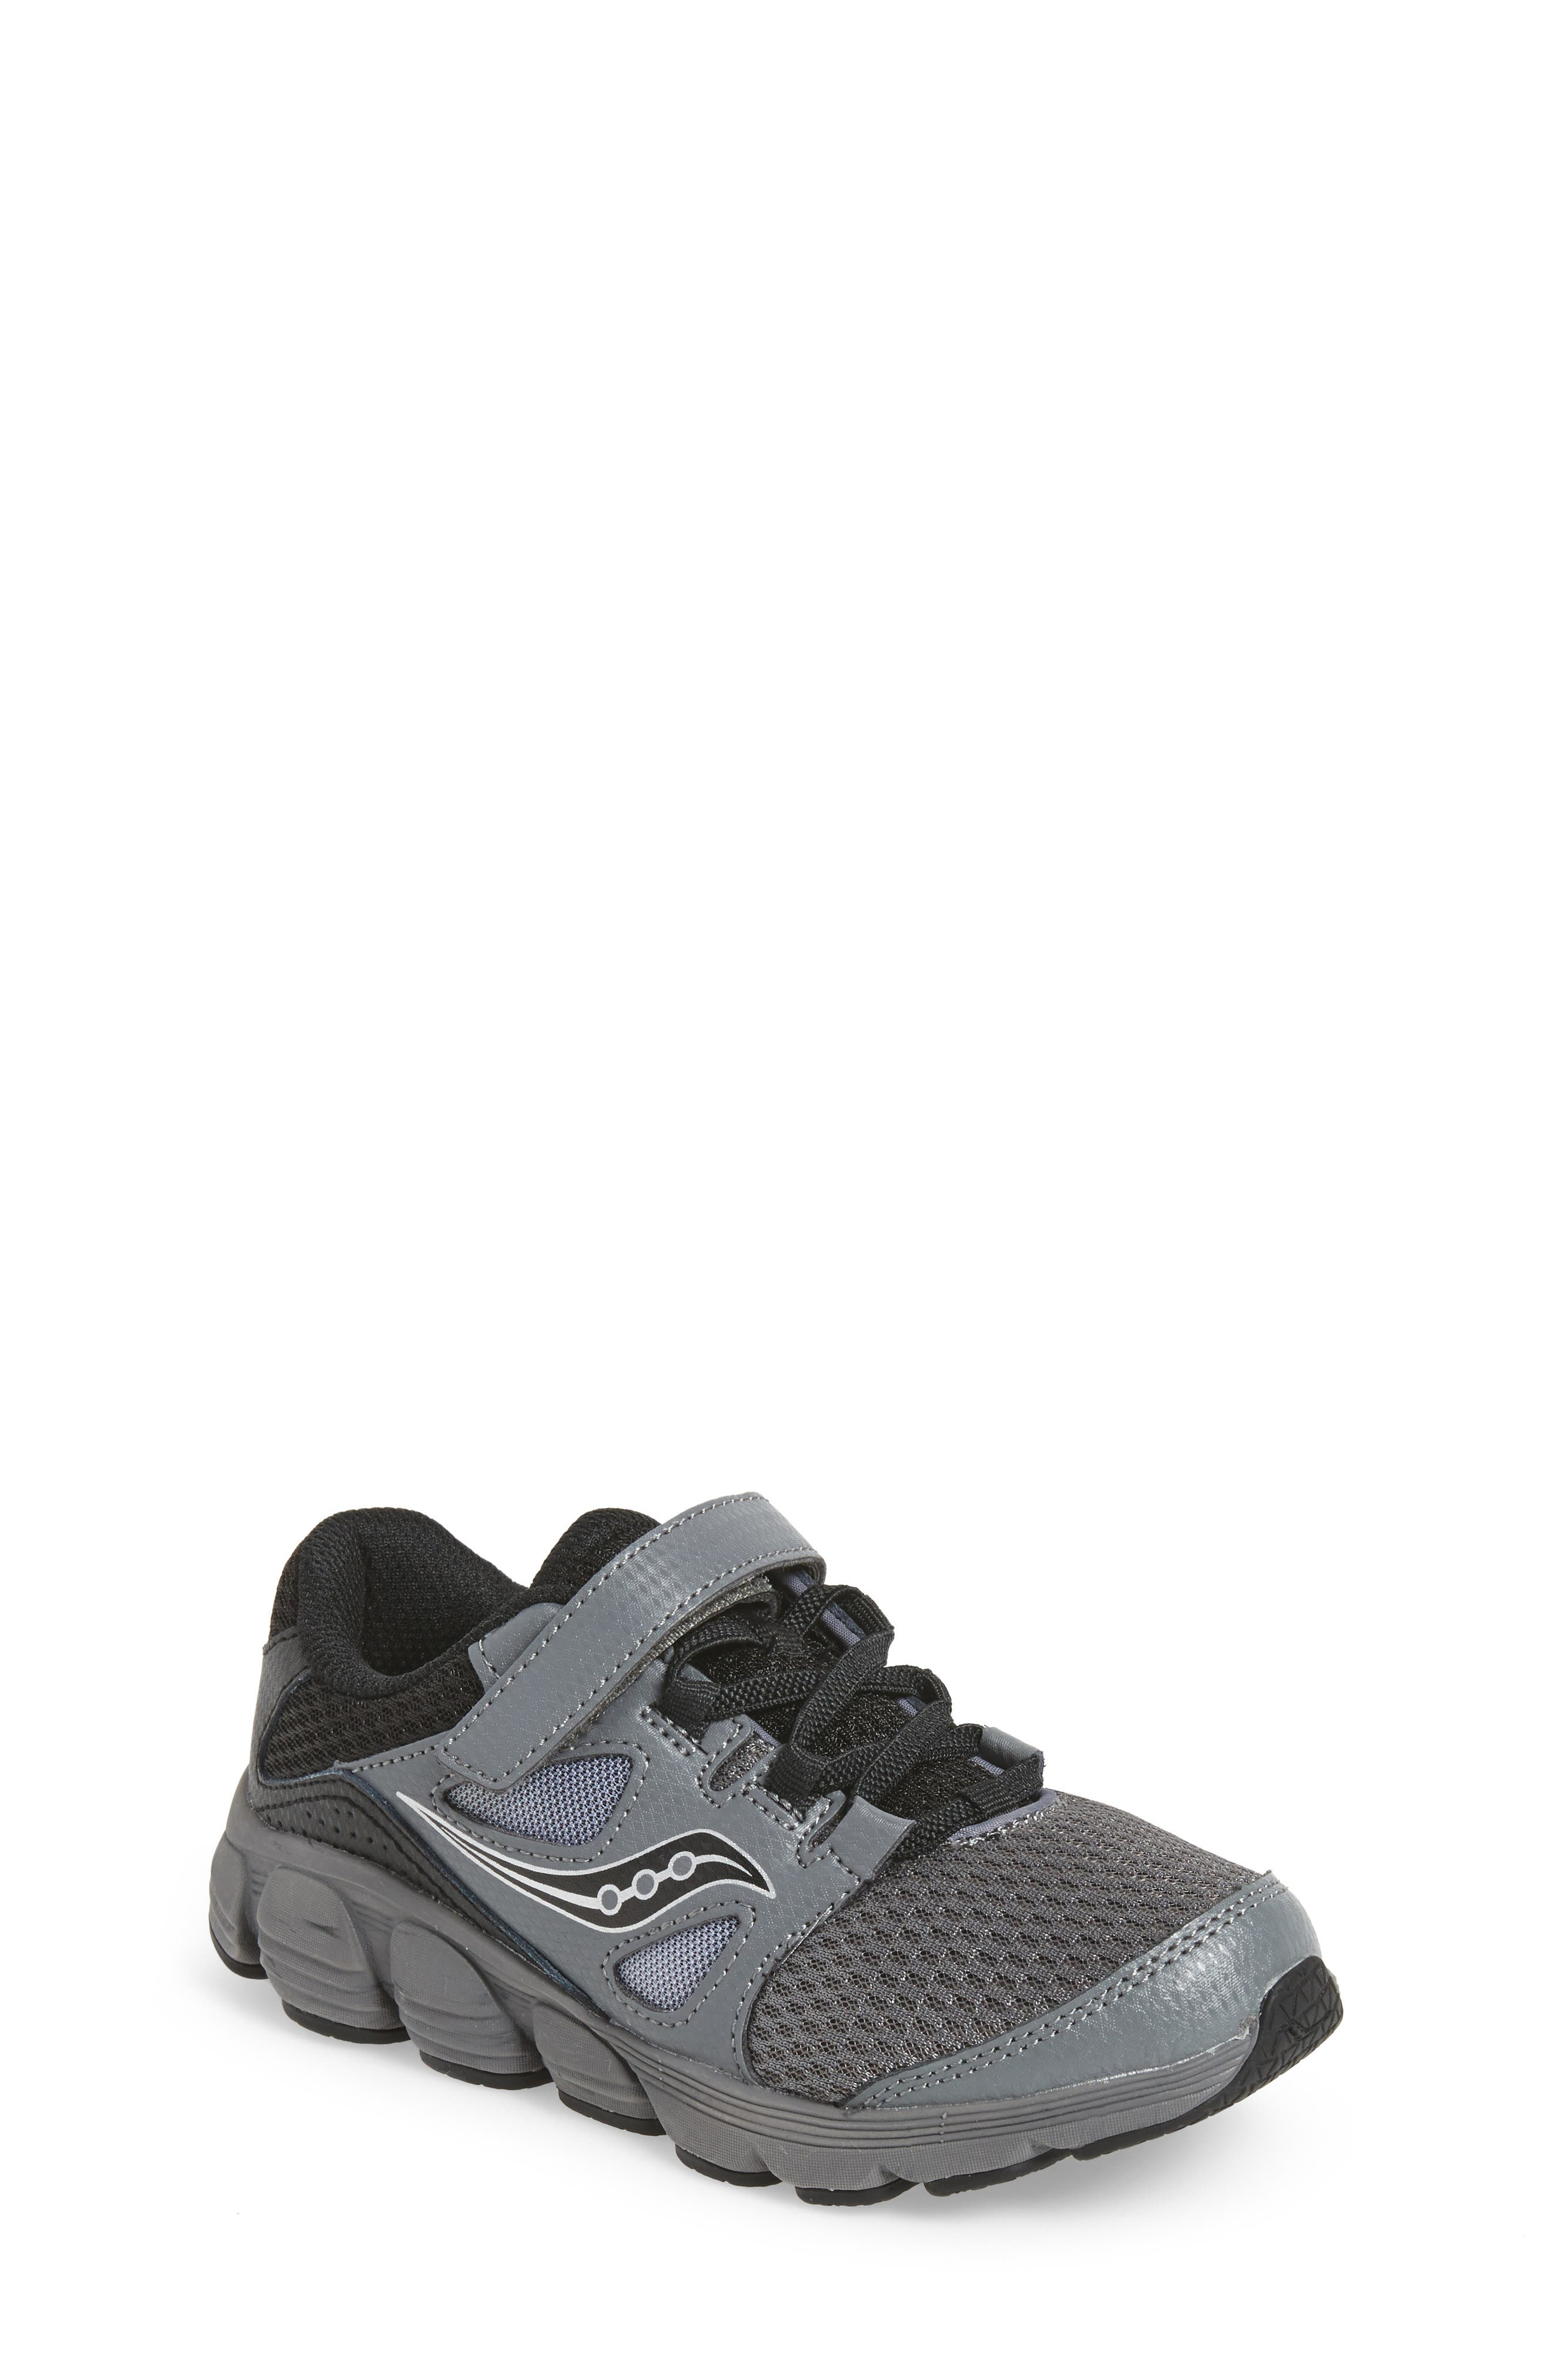 Kotaro 4 A/C Athletic Sneaker,                         Main,                         color, 021